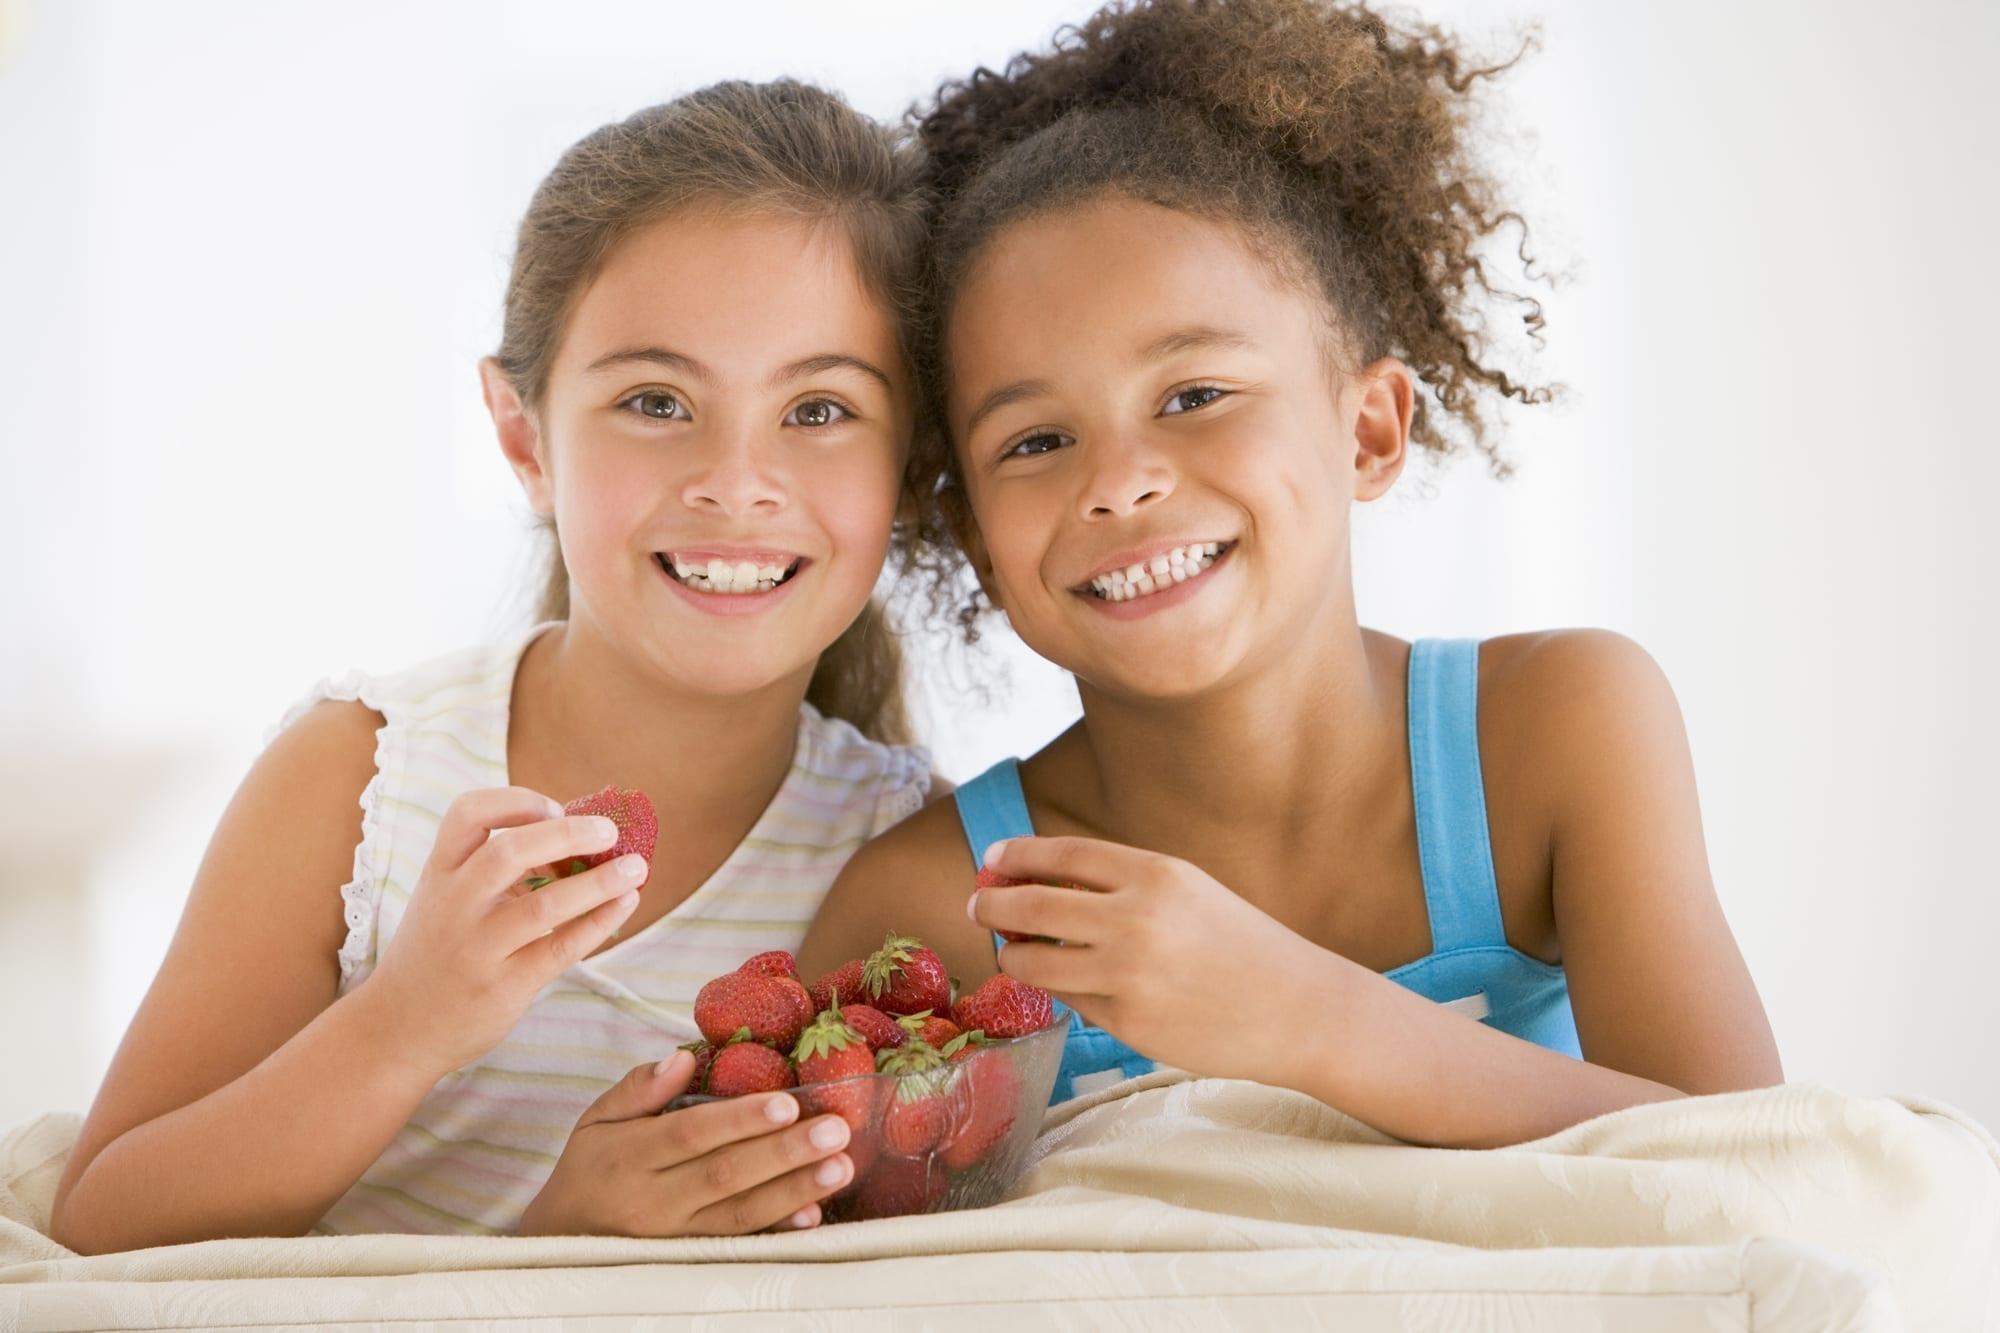 two little girls eating strawberries